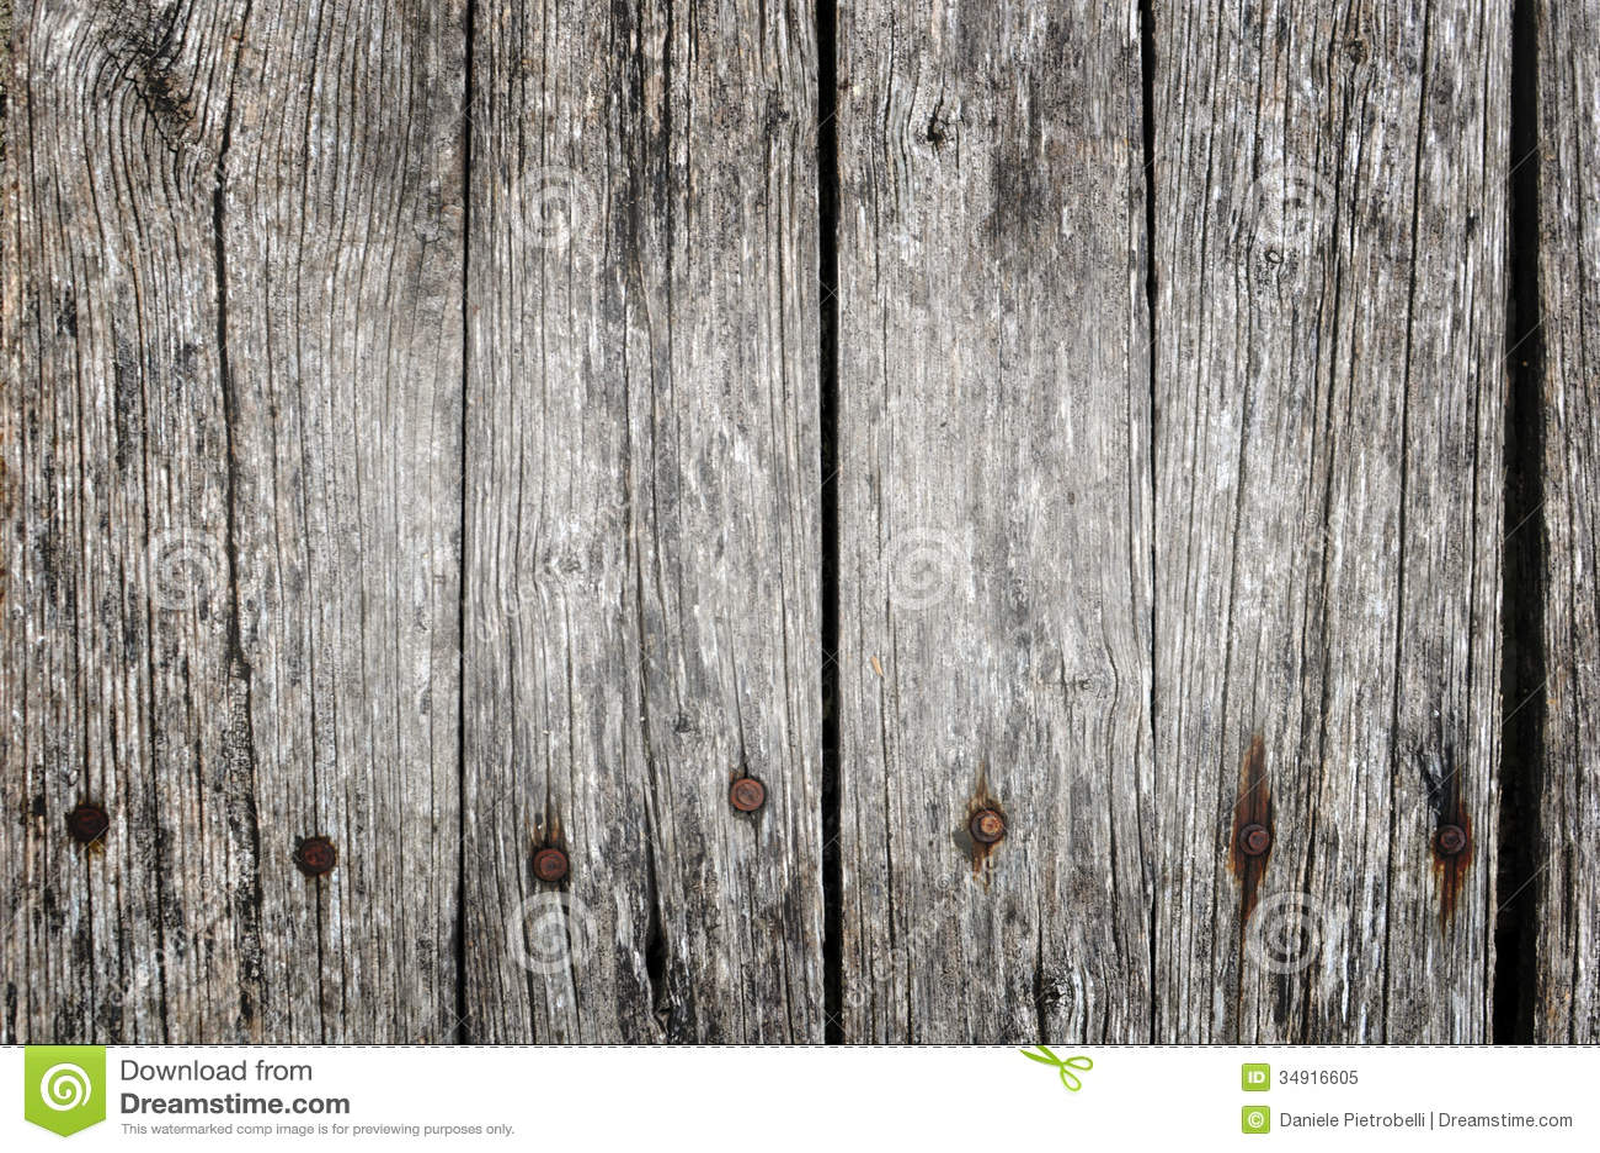 western grunge wood background stock image image of country